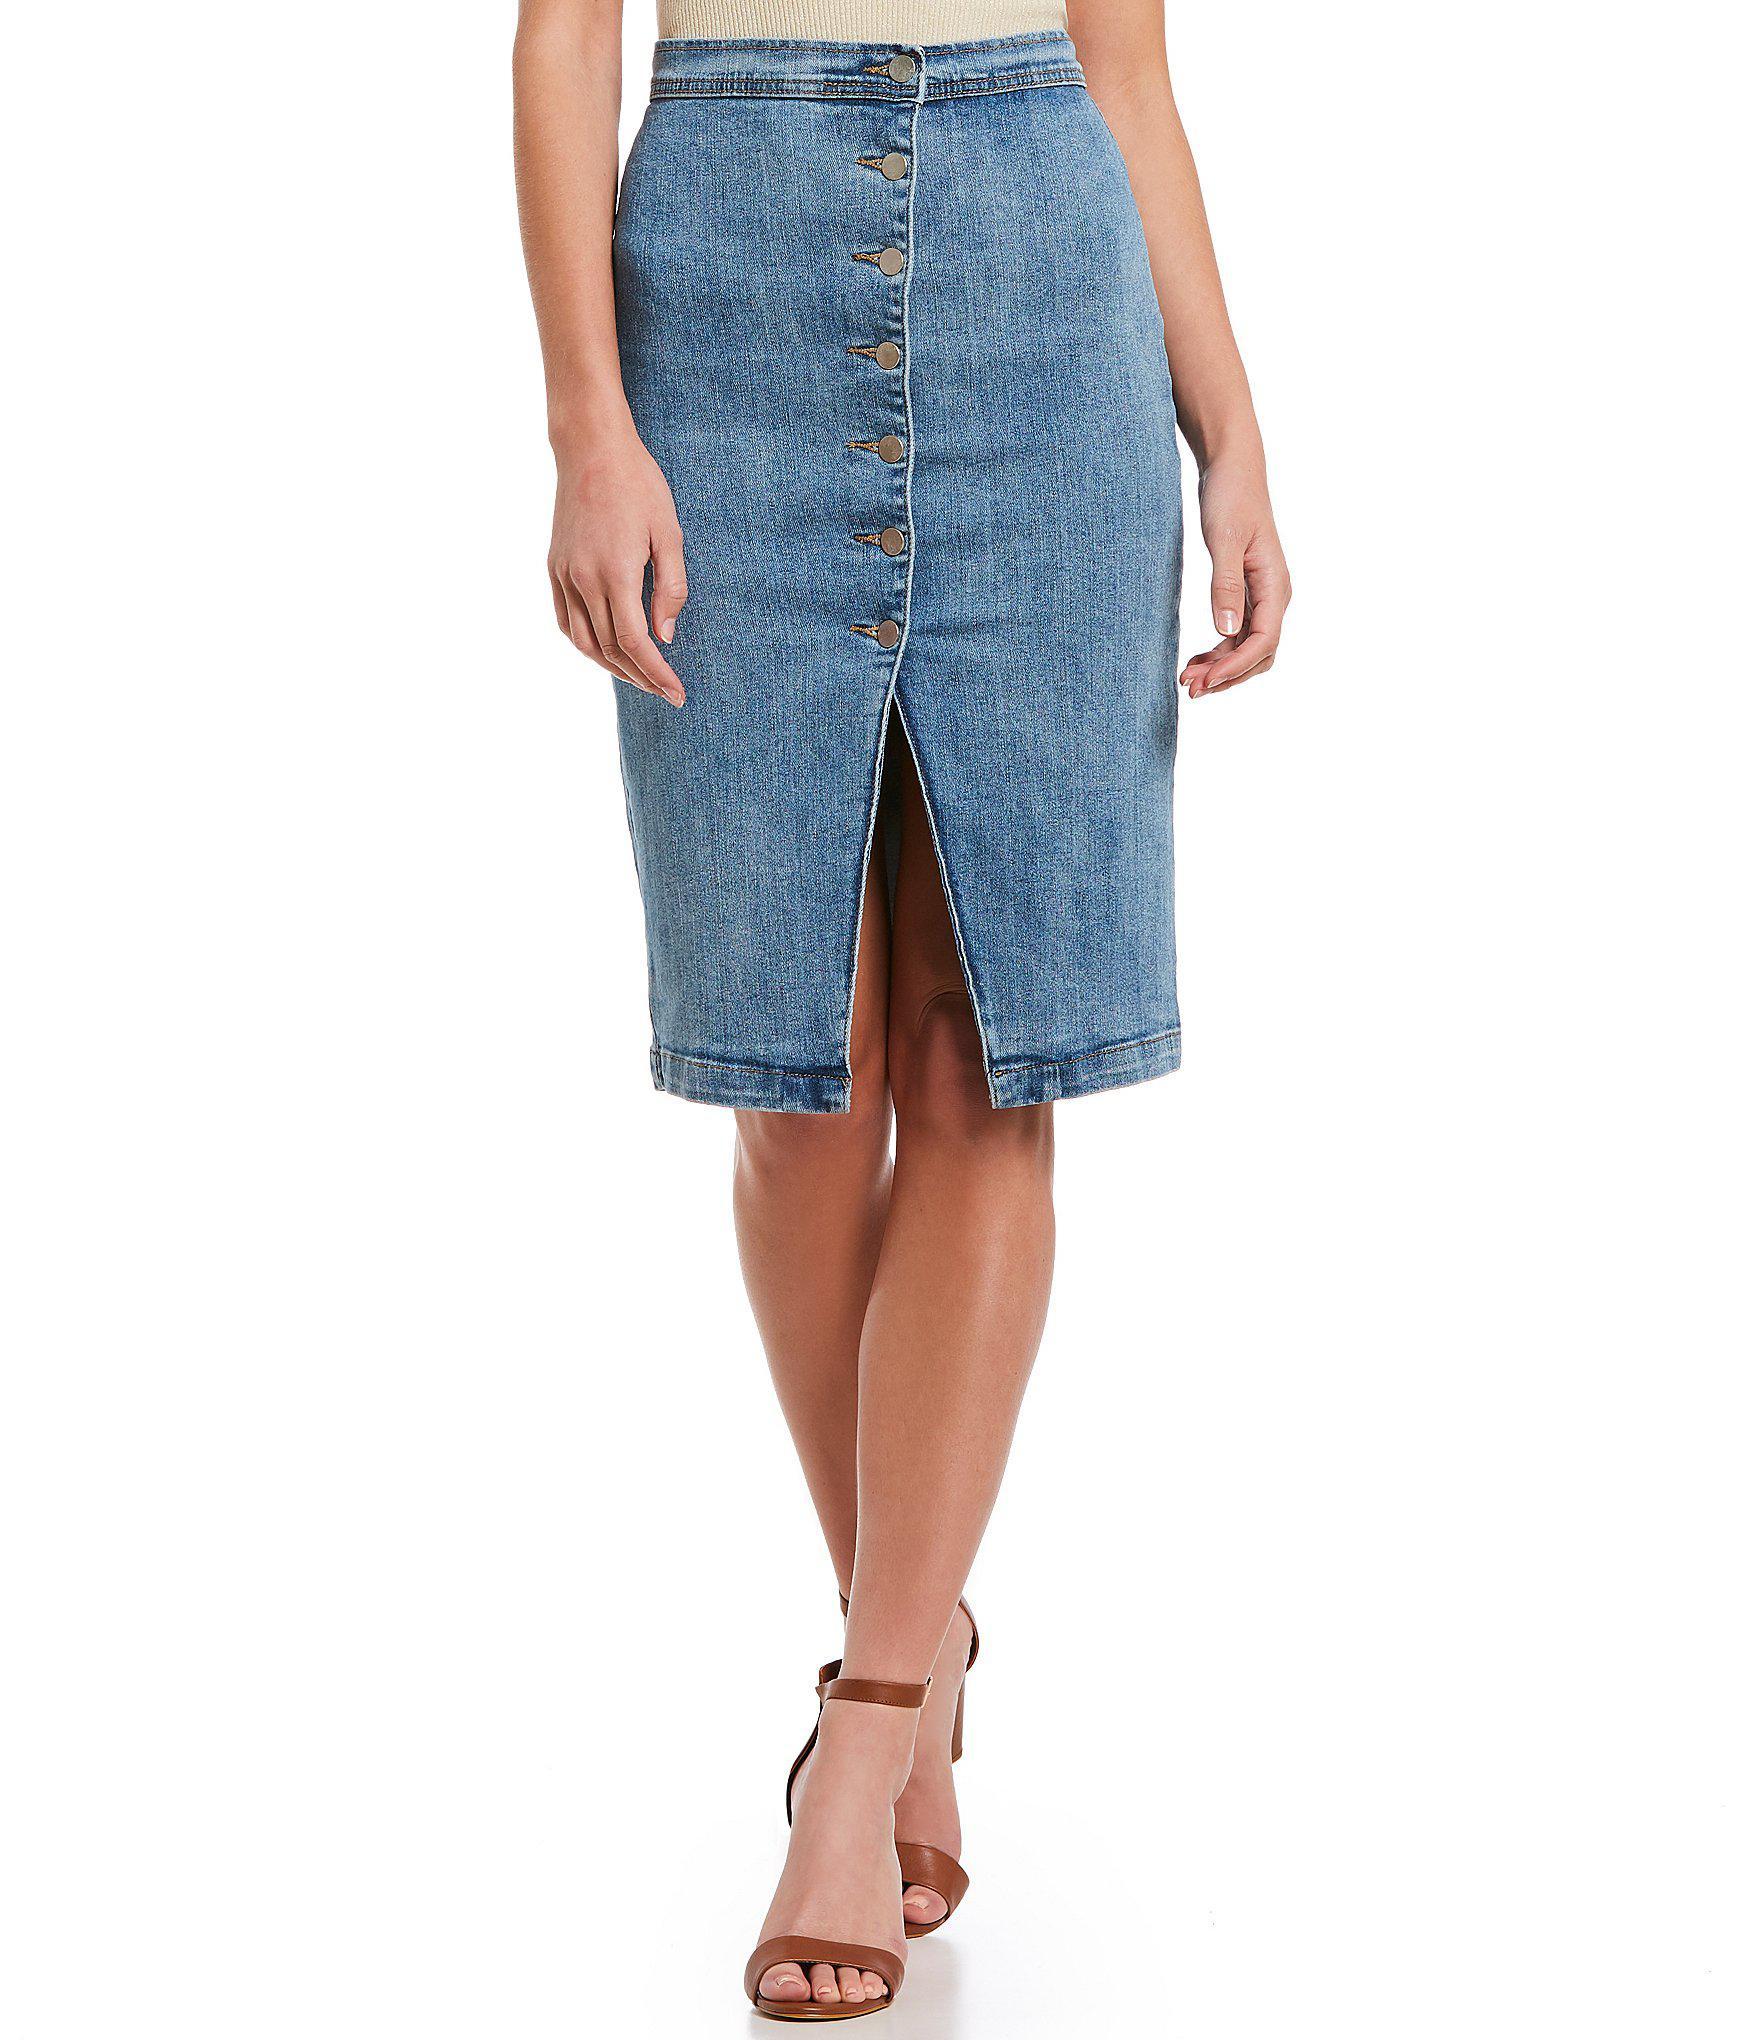 67a8d5d1d3 Gianni Bini Lacey Asymmetrical Denim Midi Skirt in Blue - Lyst